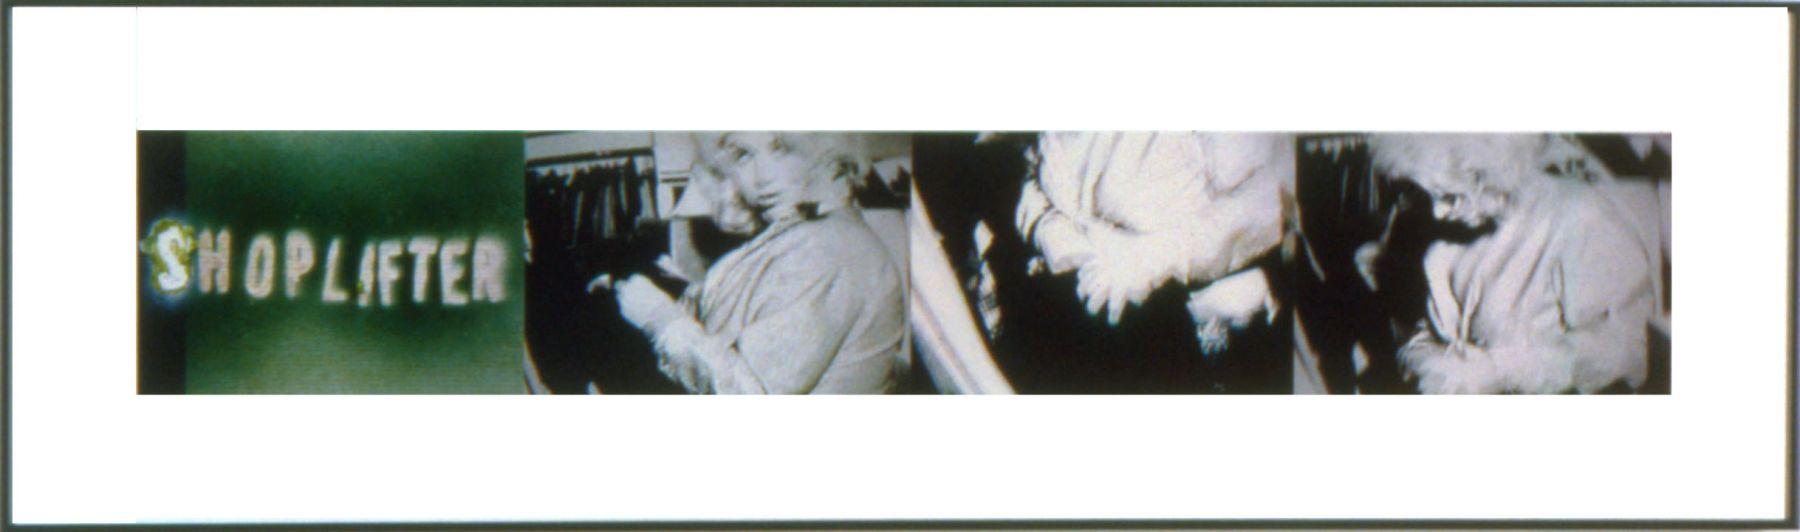 Shoplifter, 2006, 4 C-prints